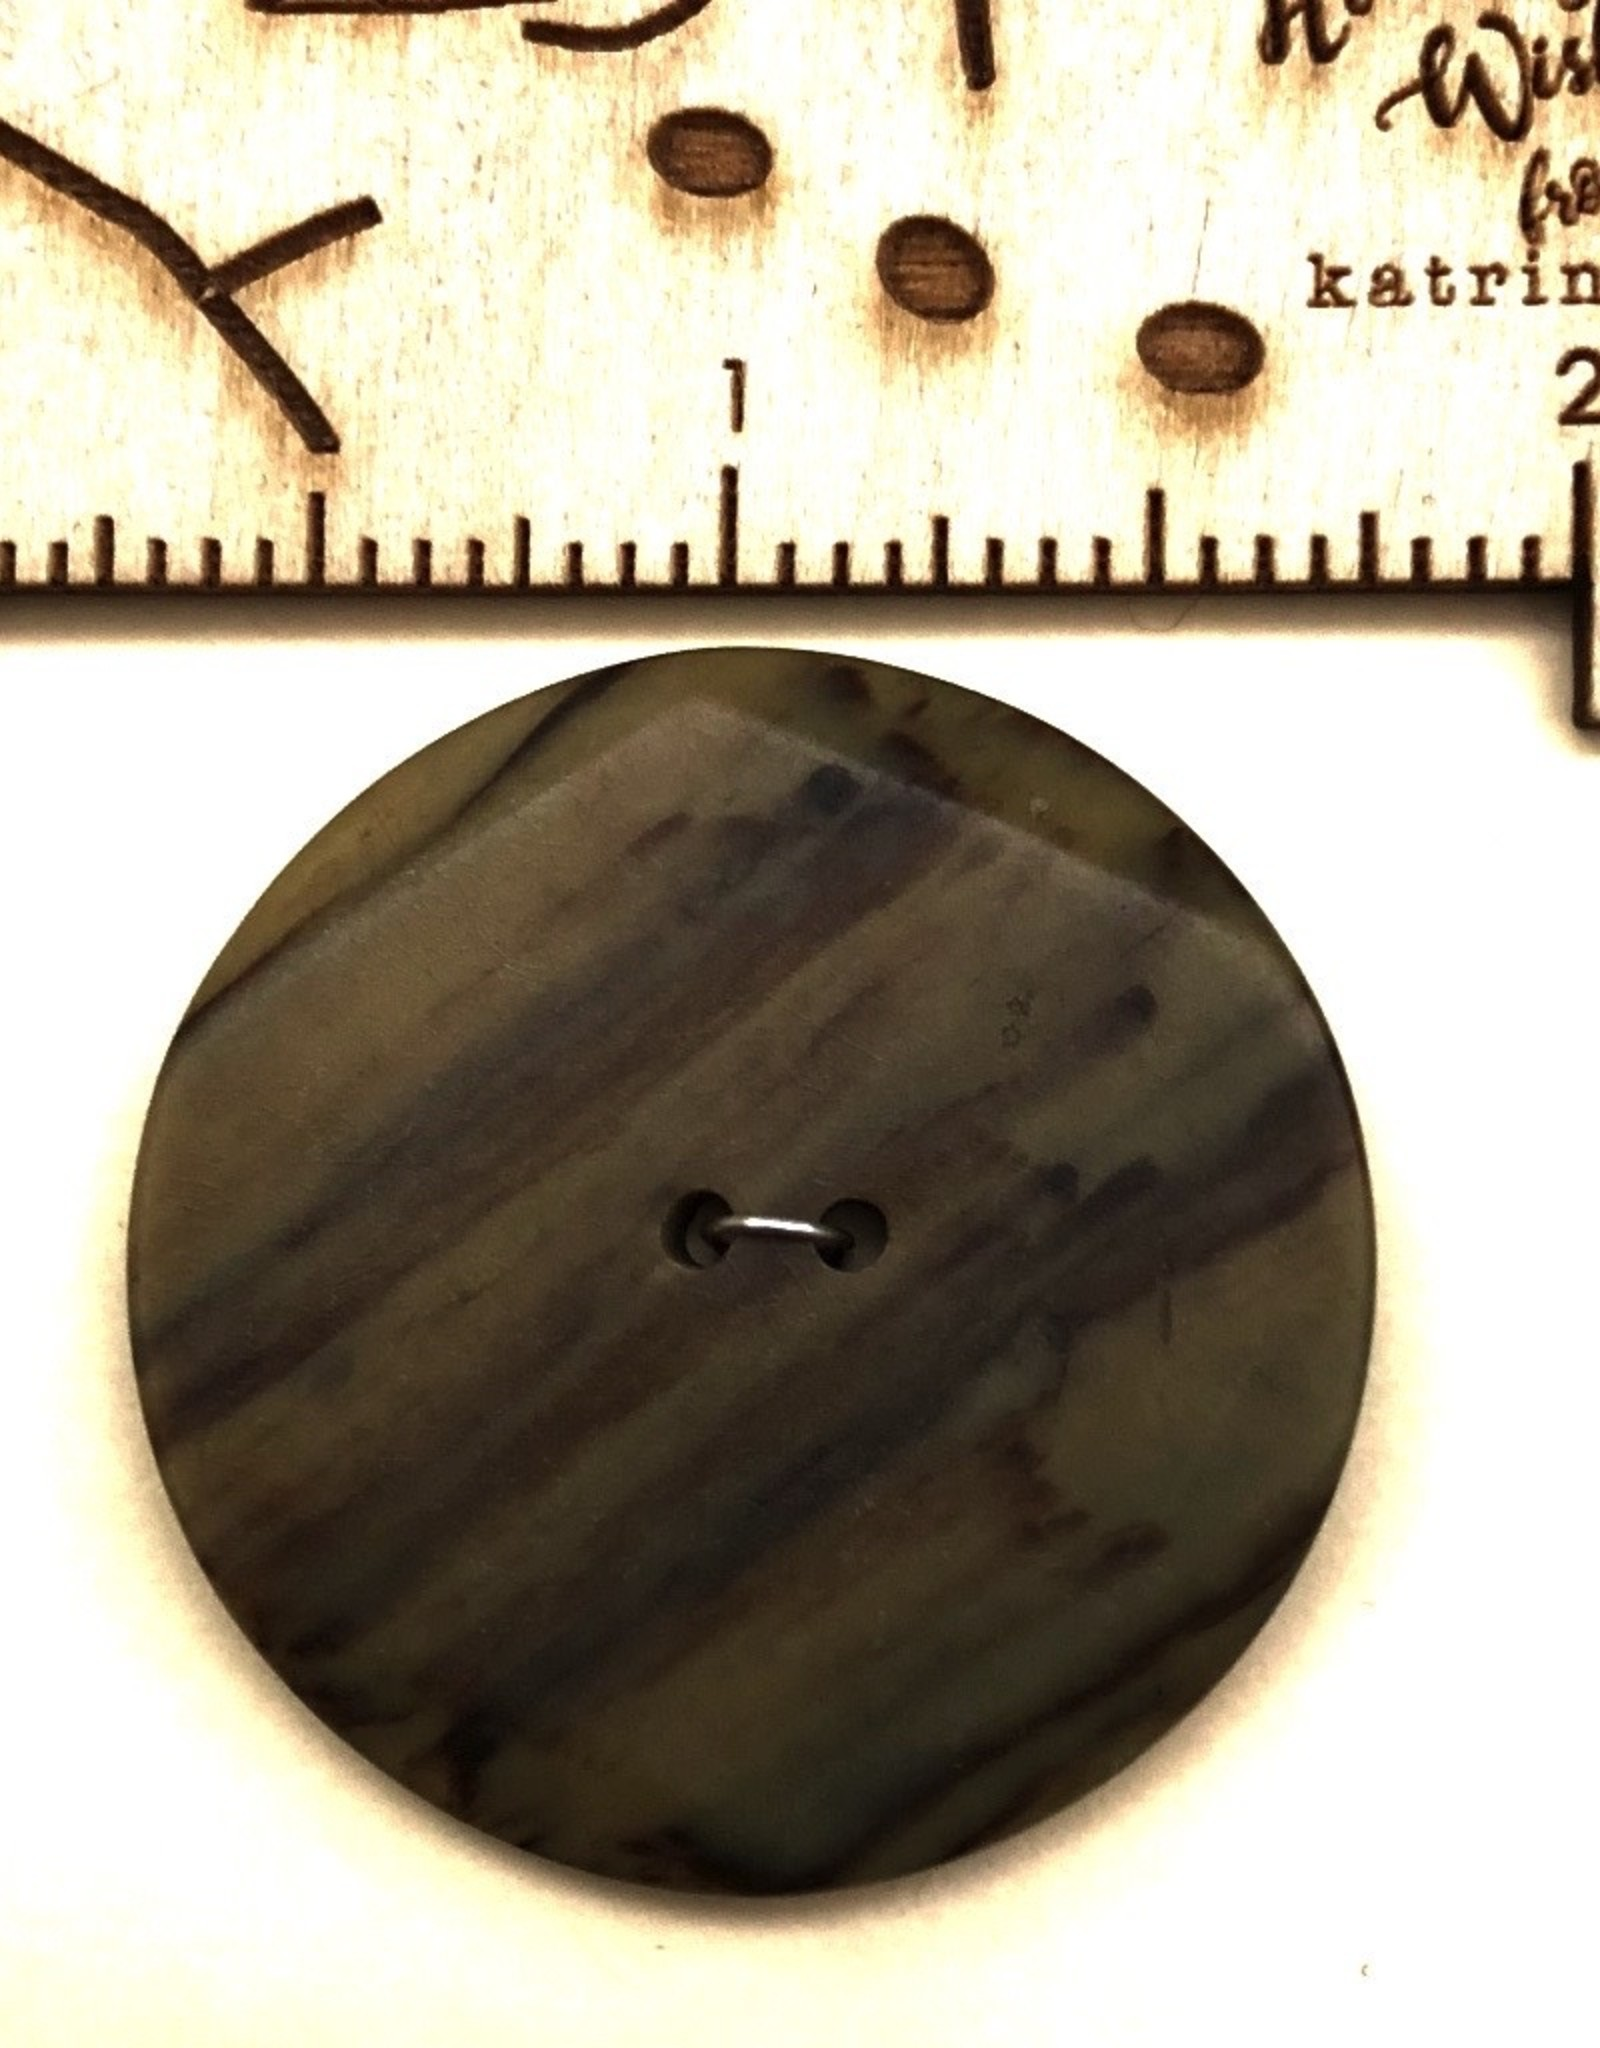 OOAK Vintage Buttons - Medium Wood Look Button - 1 per card